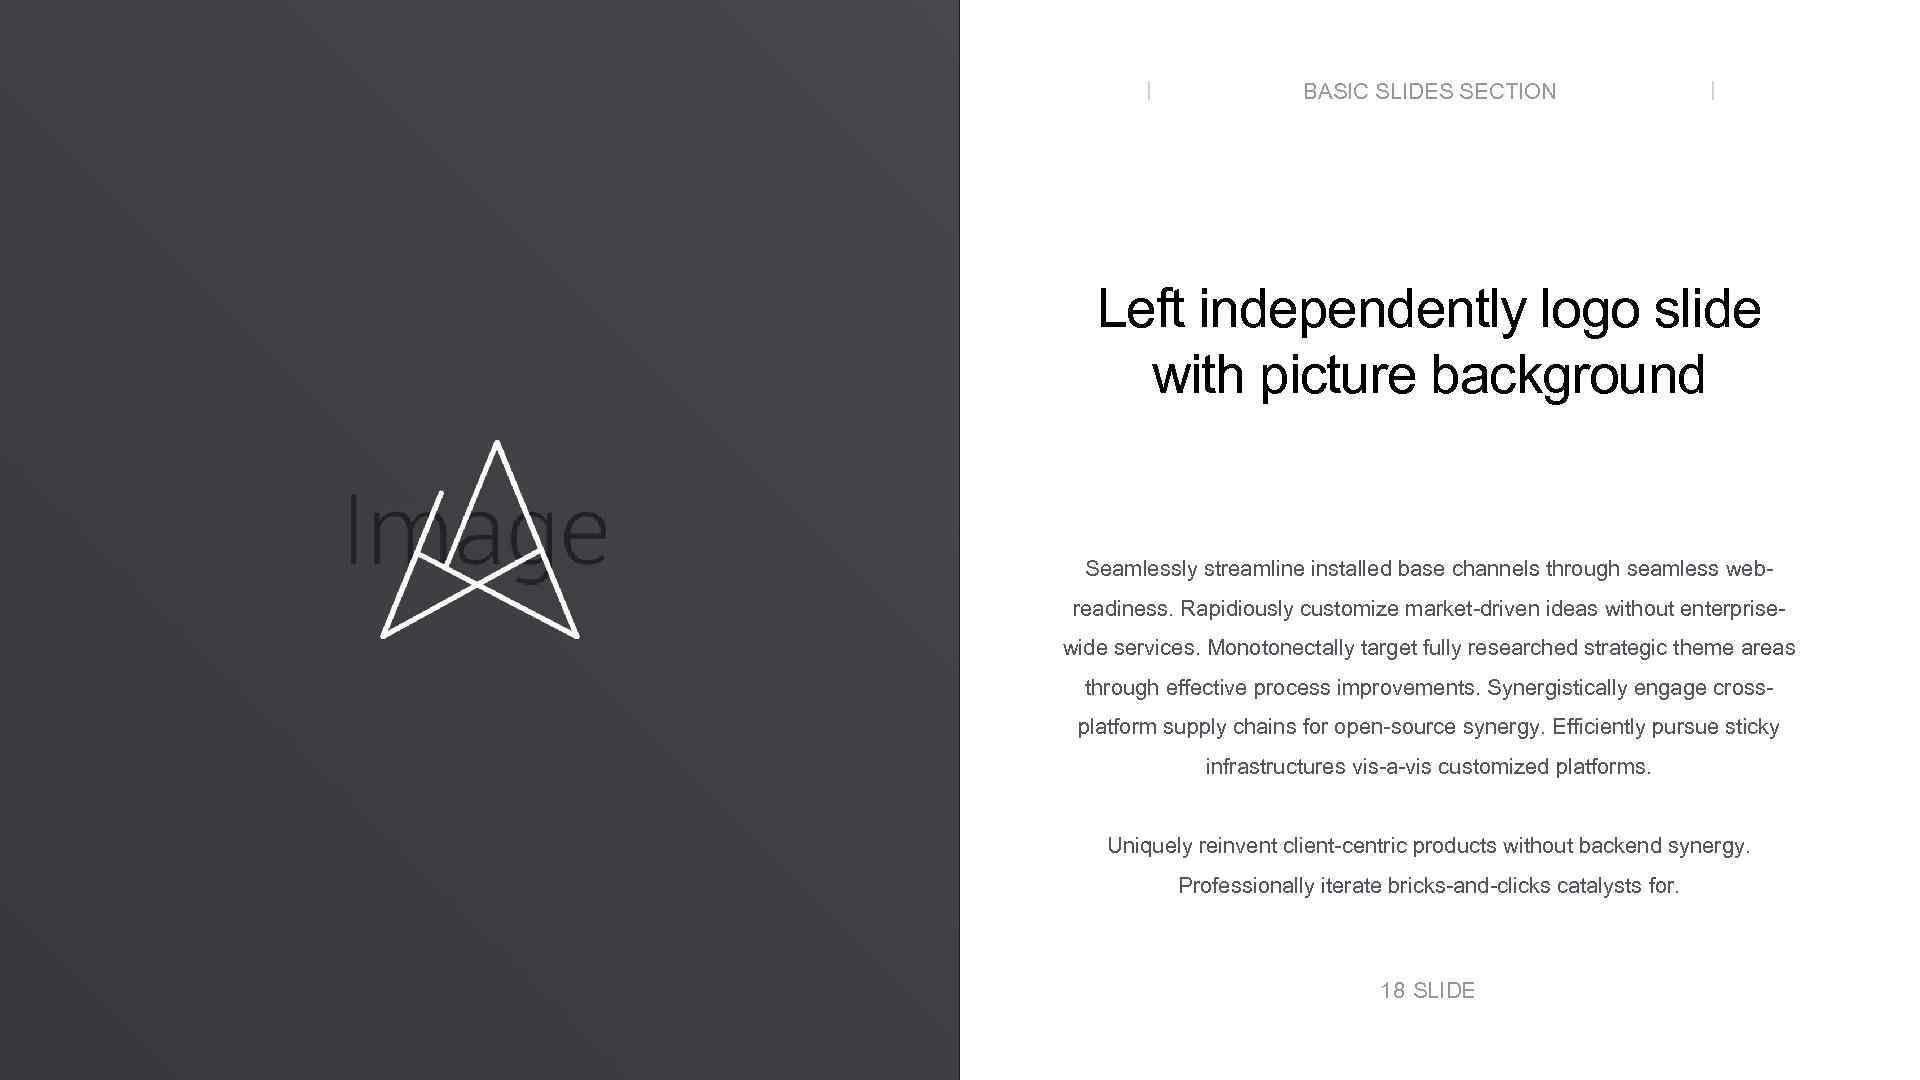 BASIC SLIDES SECTION Left independently logo slide with picture background Seamlessly streamline installed base